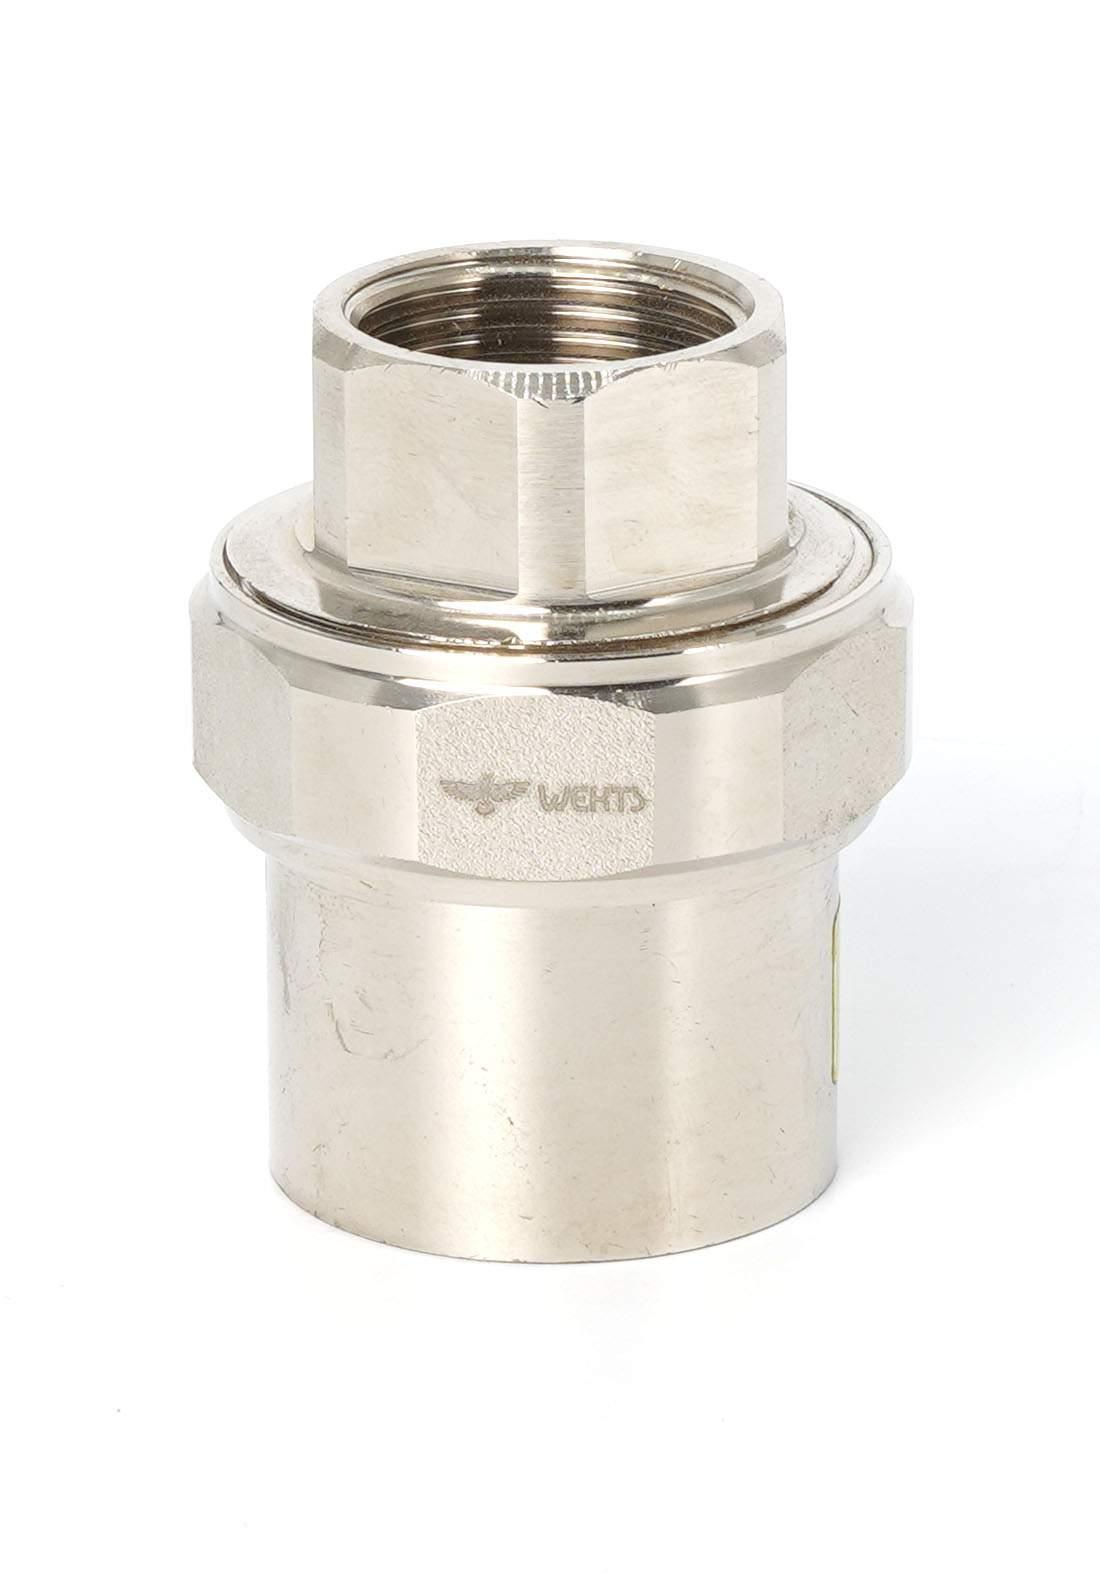 "Wekts 5280 Connector Pipe / Adapter 4/3 × 25"" سن انابيب داخلي براص"